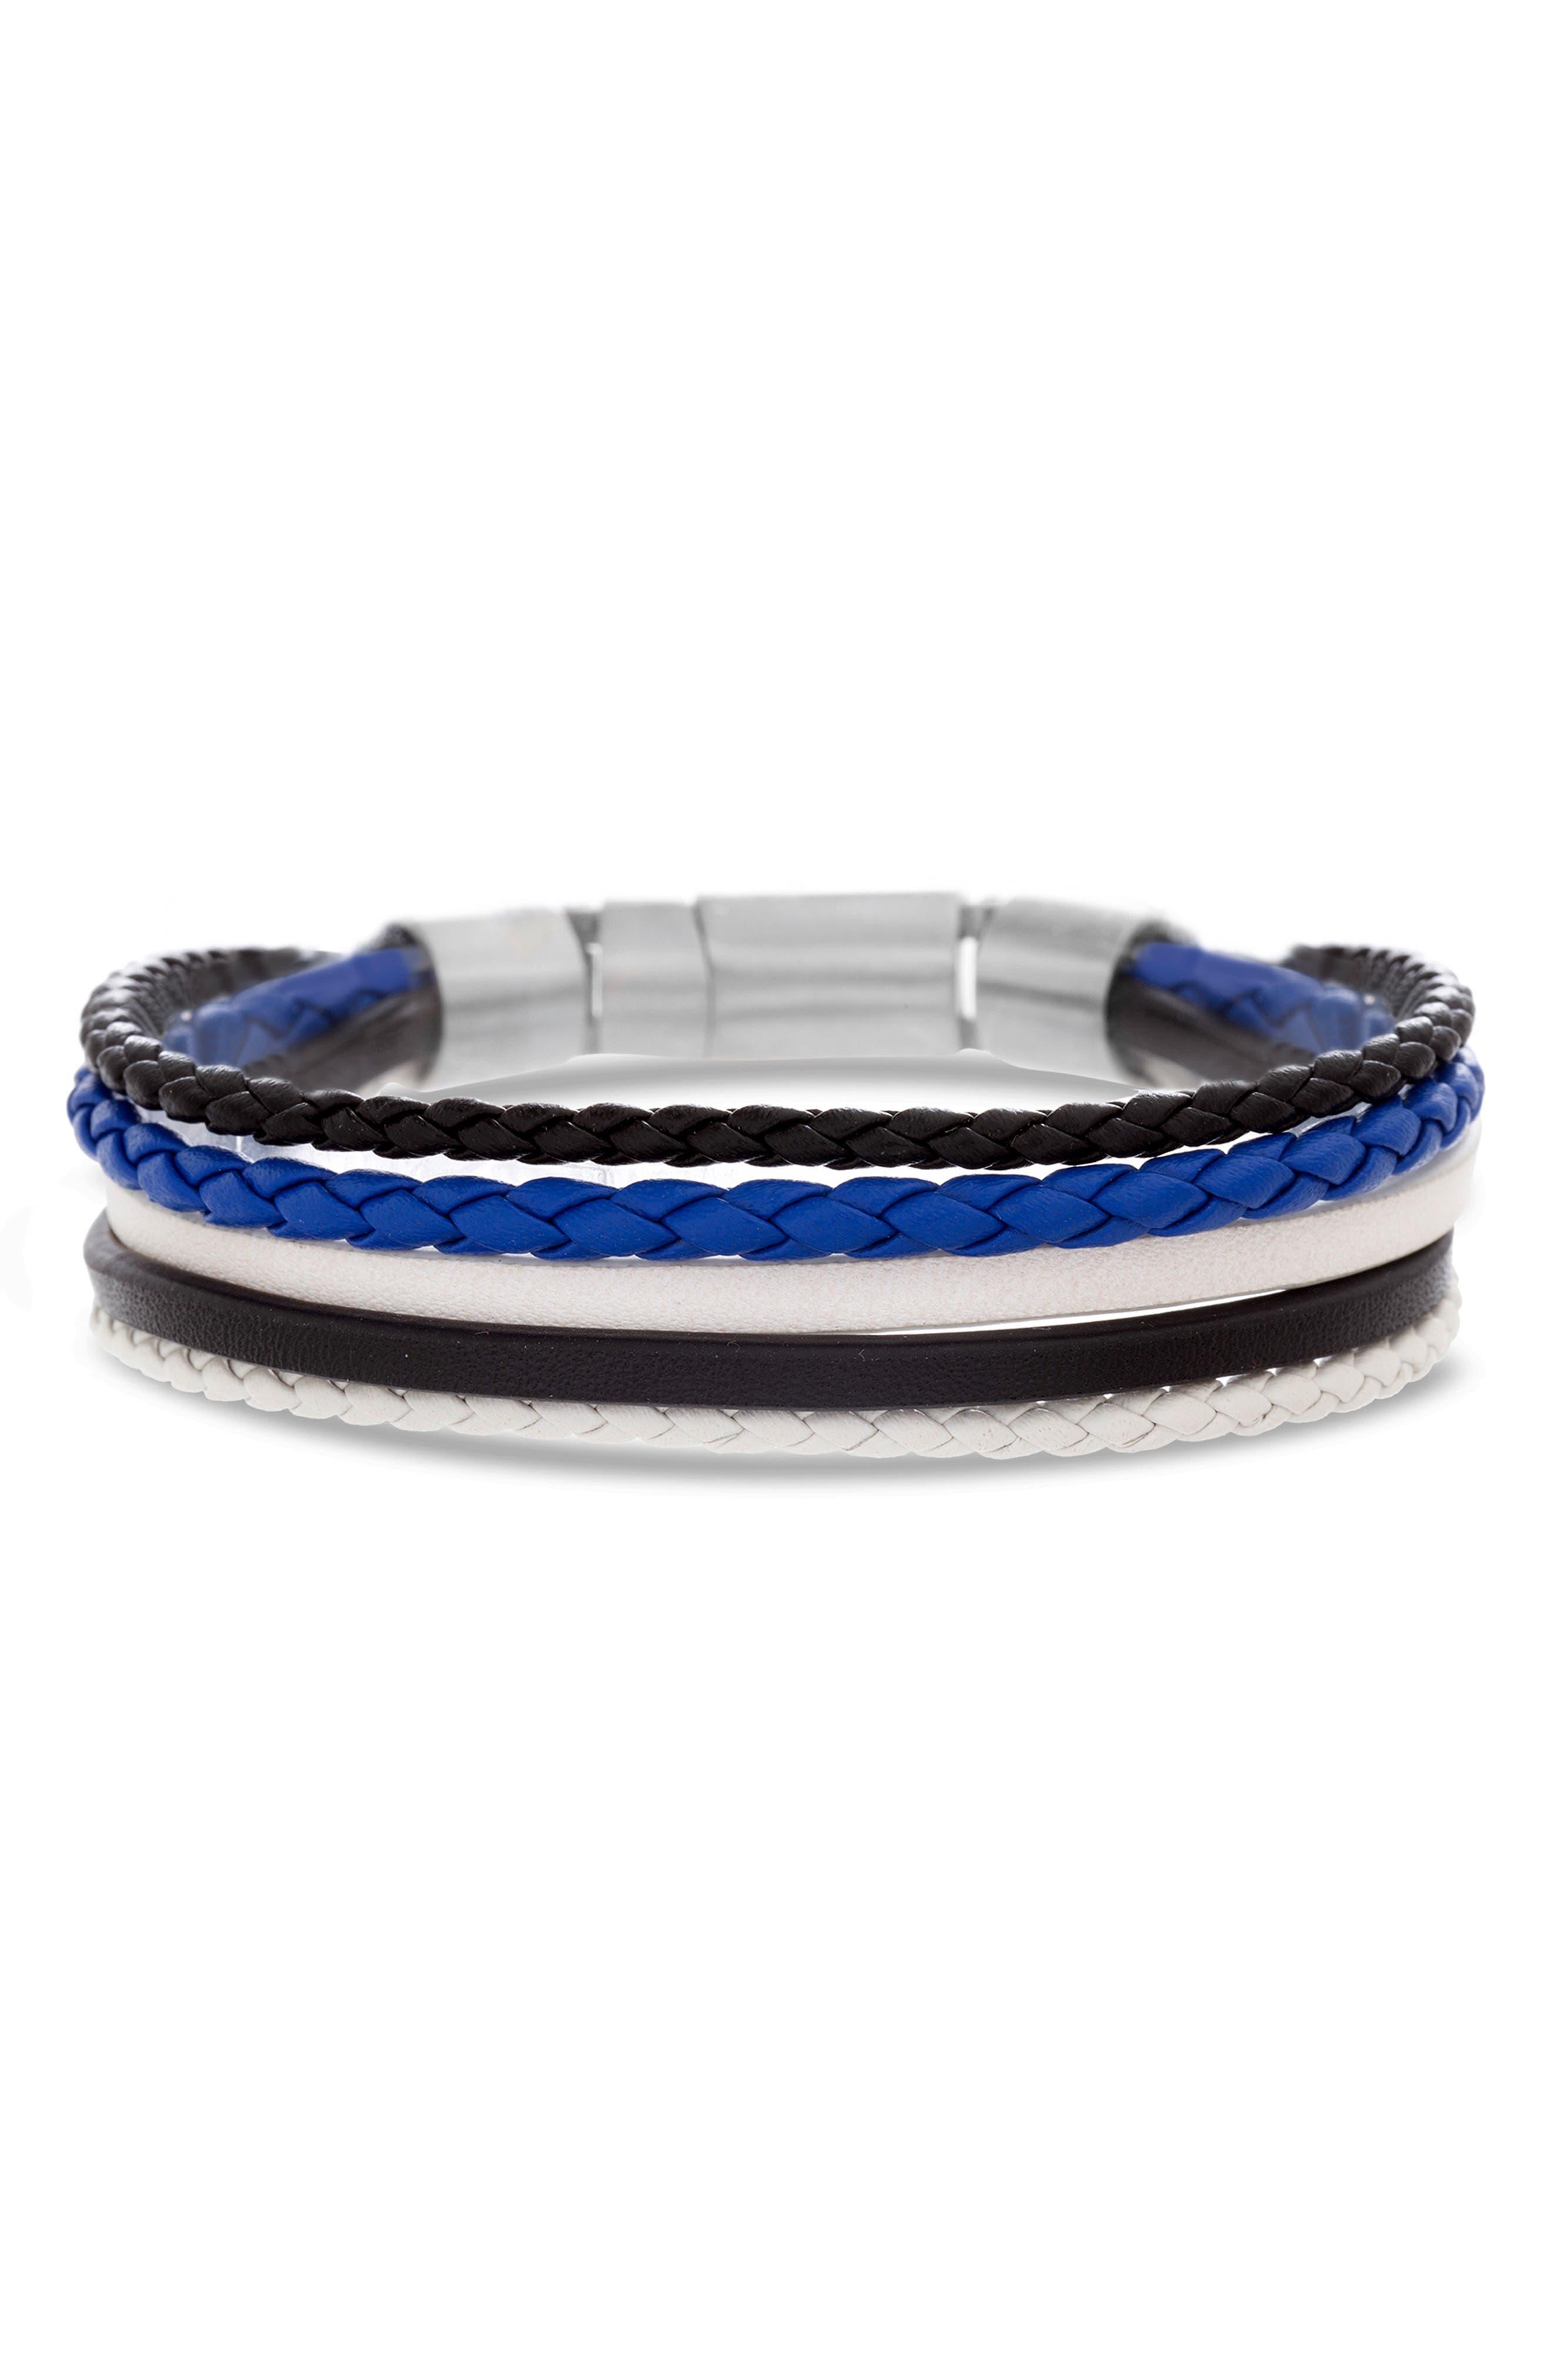 BEN SHERMAN Steel & Leather Bracelet in Black/ Blue/ White